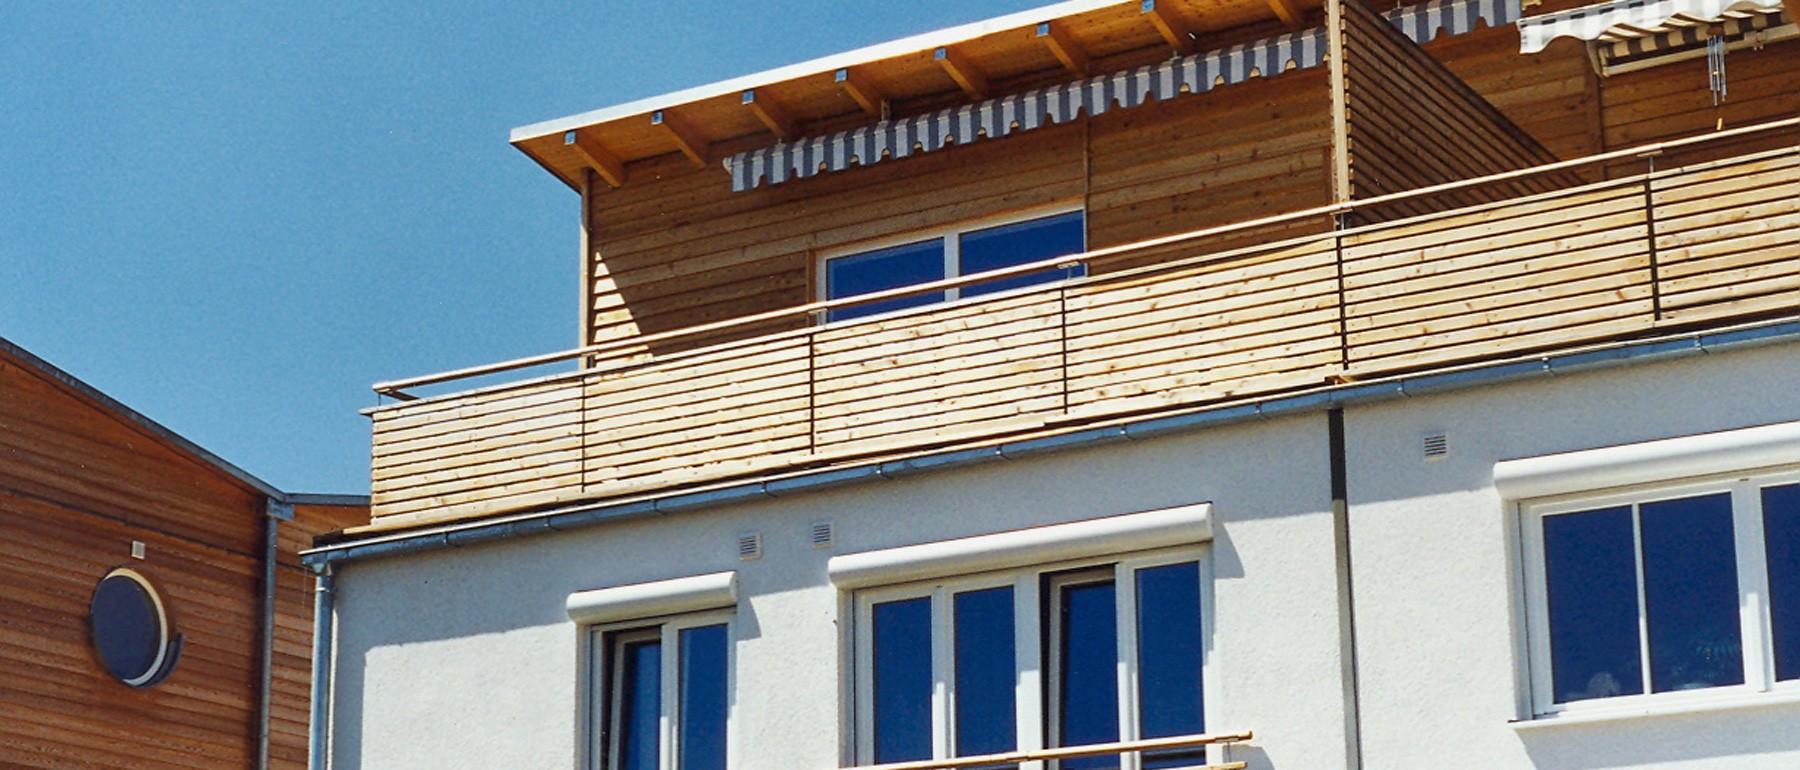 mfh m nchen jura holzbau holzhaus bayern holzhaus regensburg holzhaus ingolstadt holzhaus neumarkt. Black Bedroom Furniture Sets. Home Design Ideas